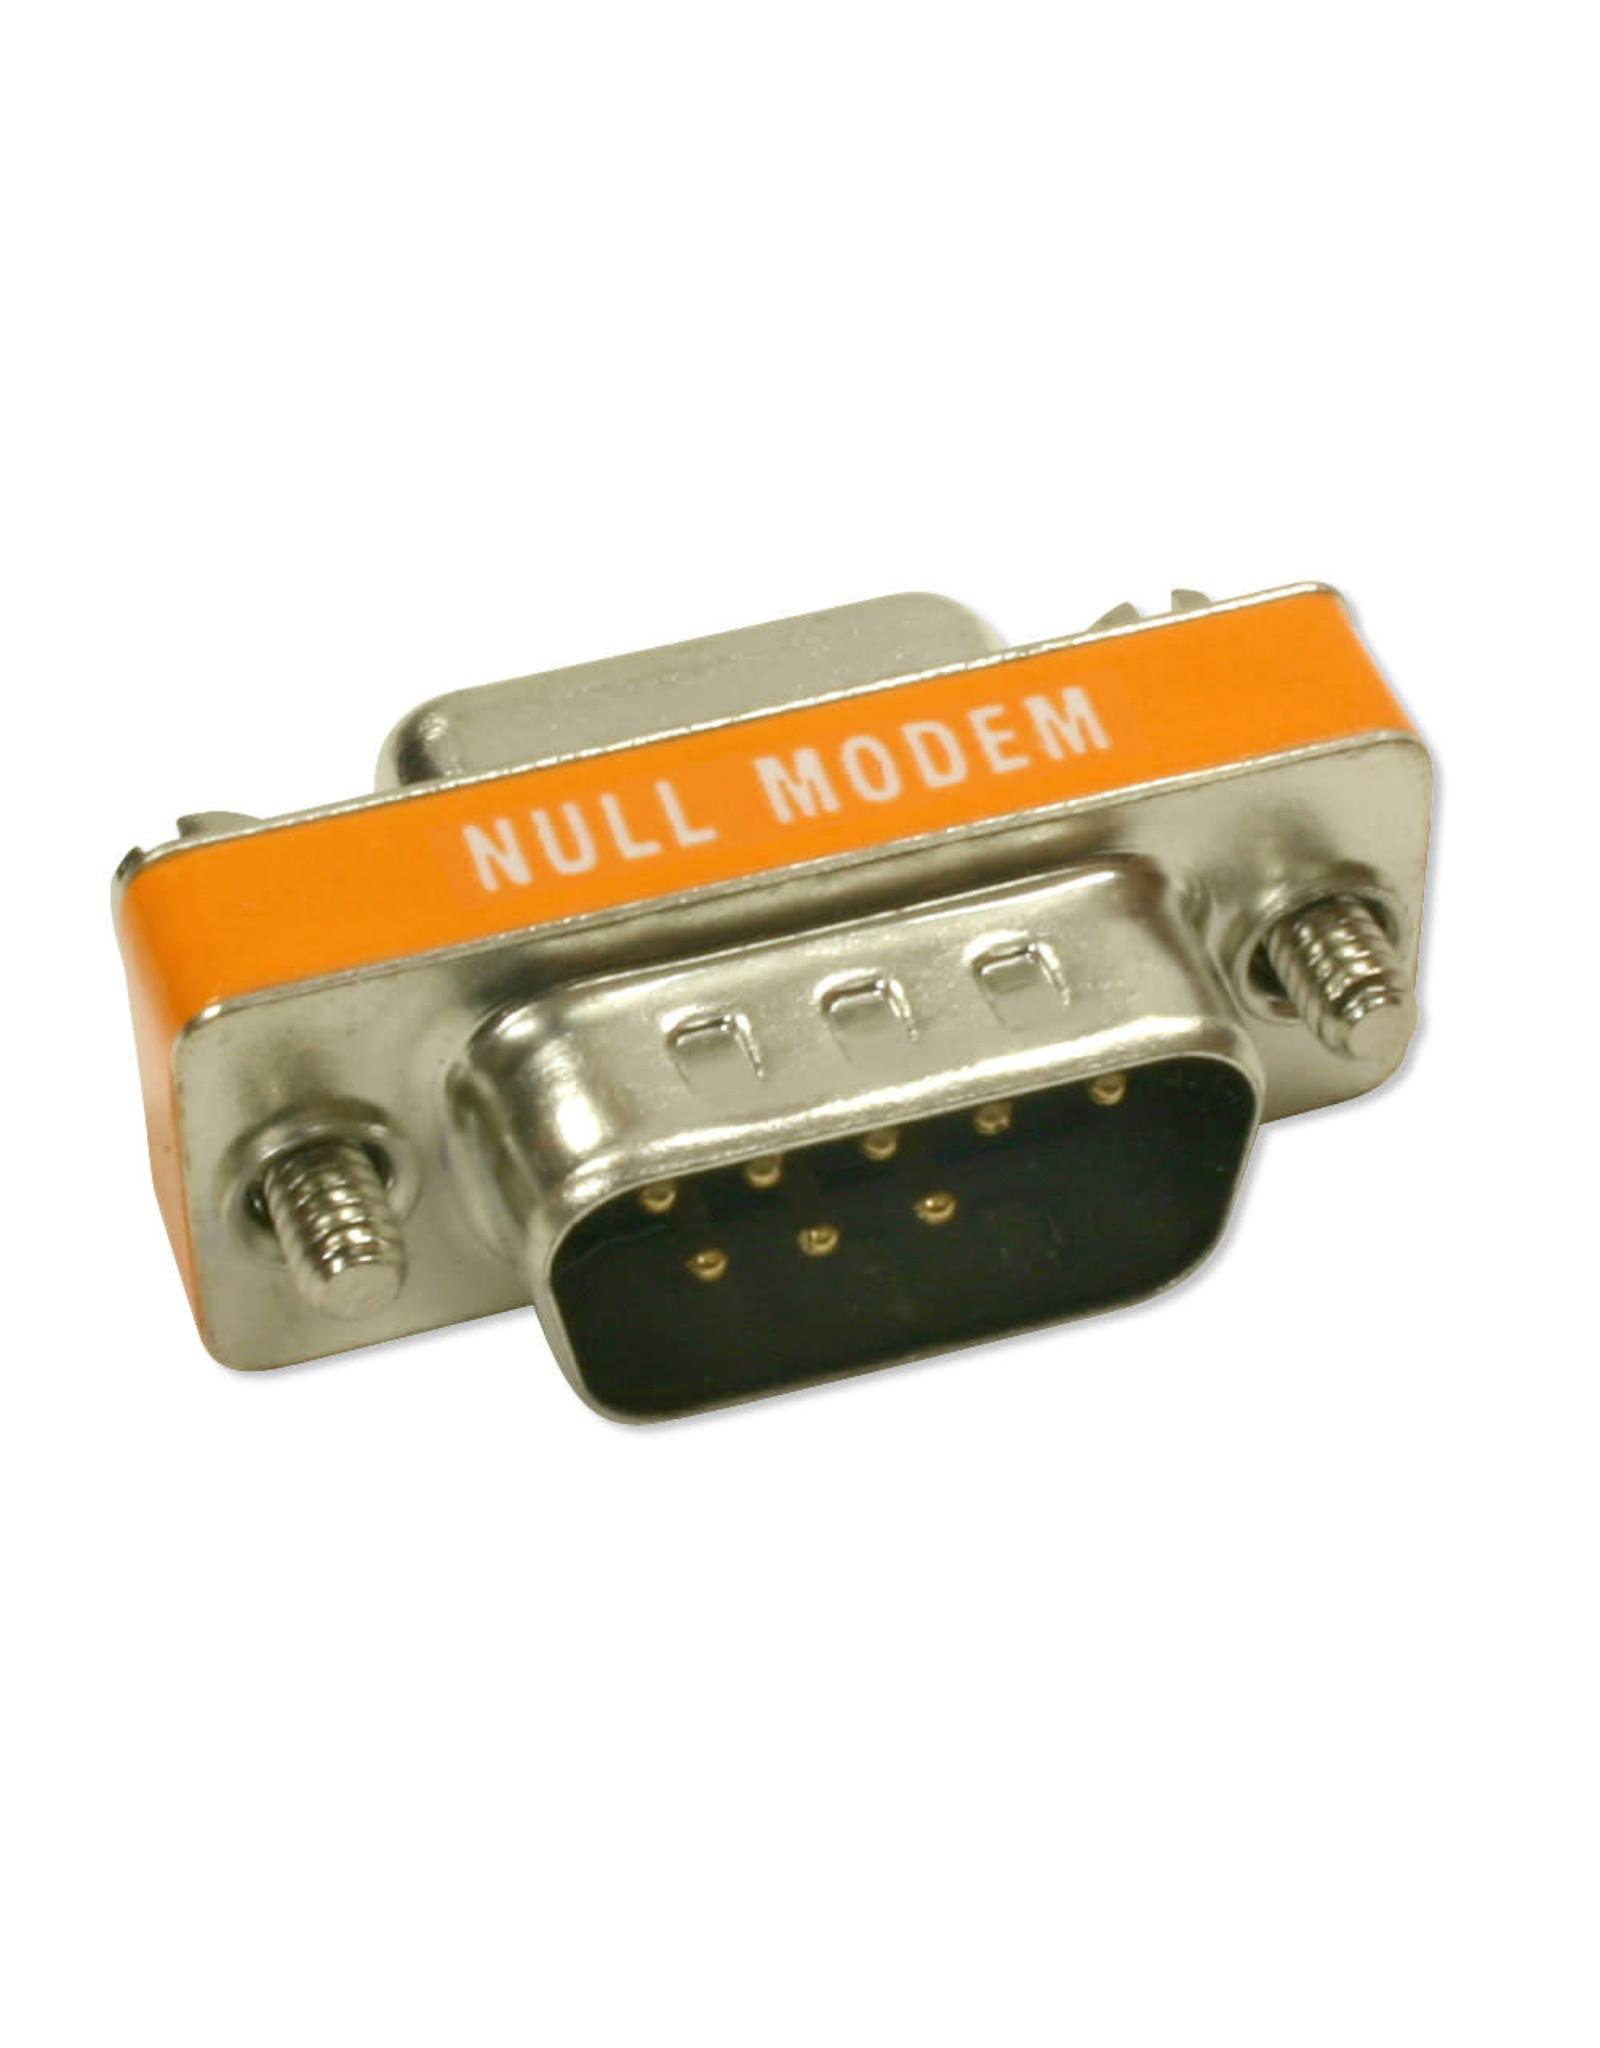 BlueDiamond BlueDiamond, Mini Null Modem M/M DB9 Adapter